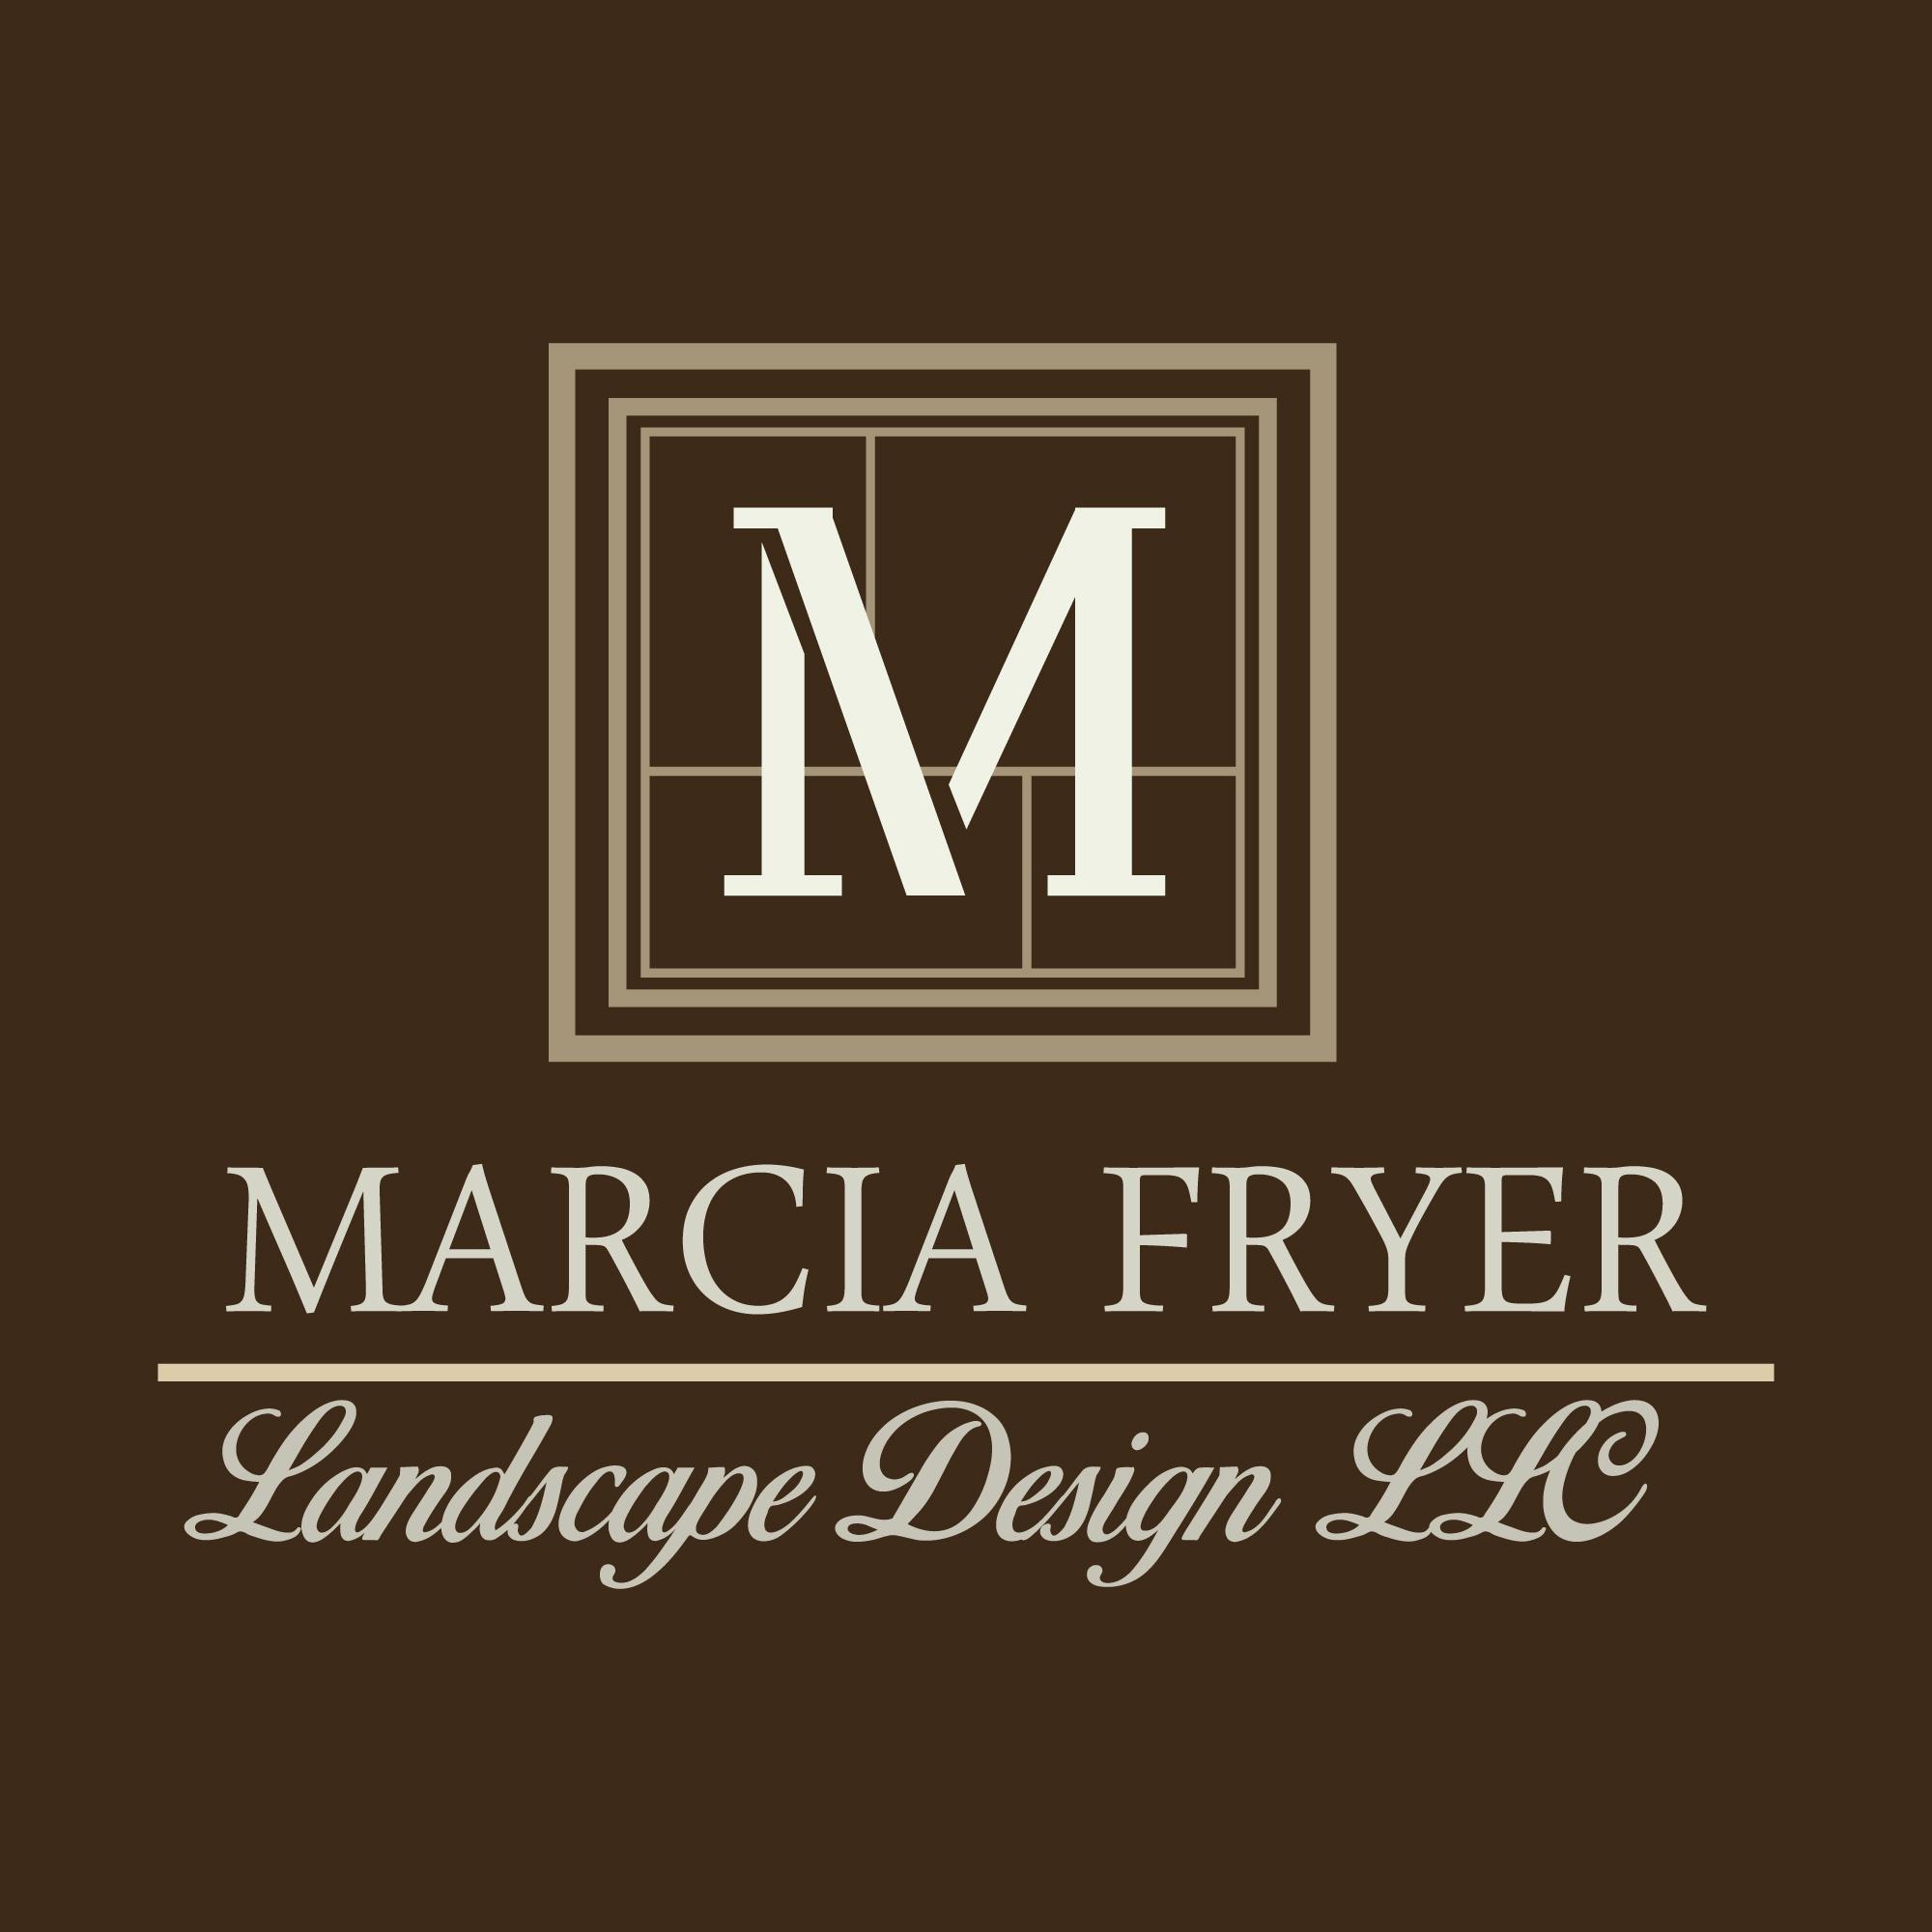 Marcia Fryer Landscape Design | Richmond, VA